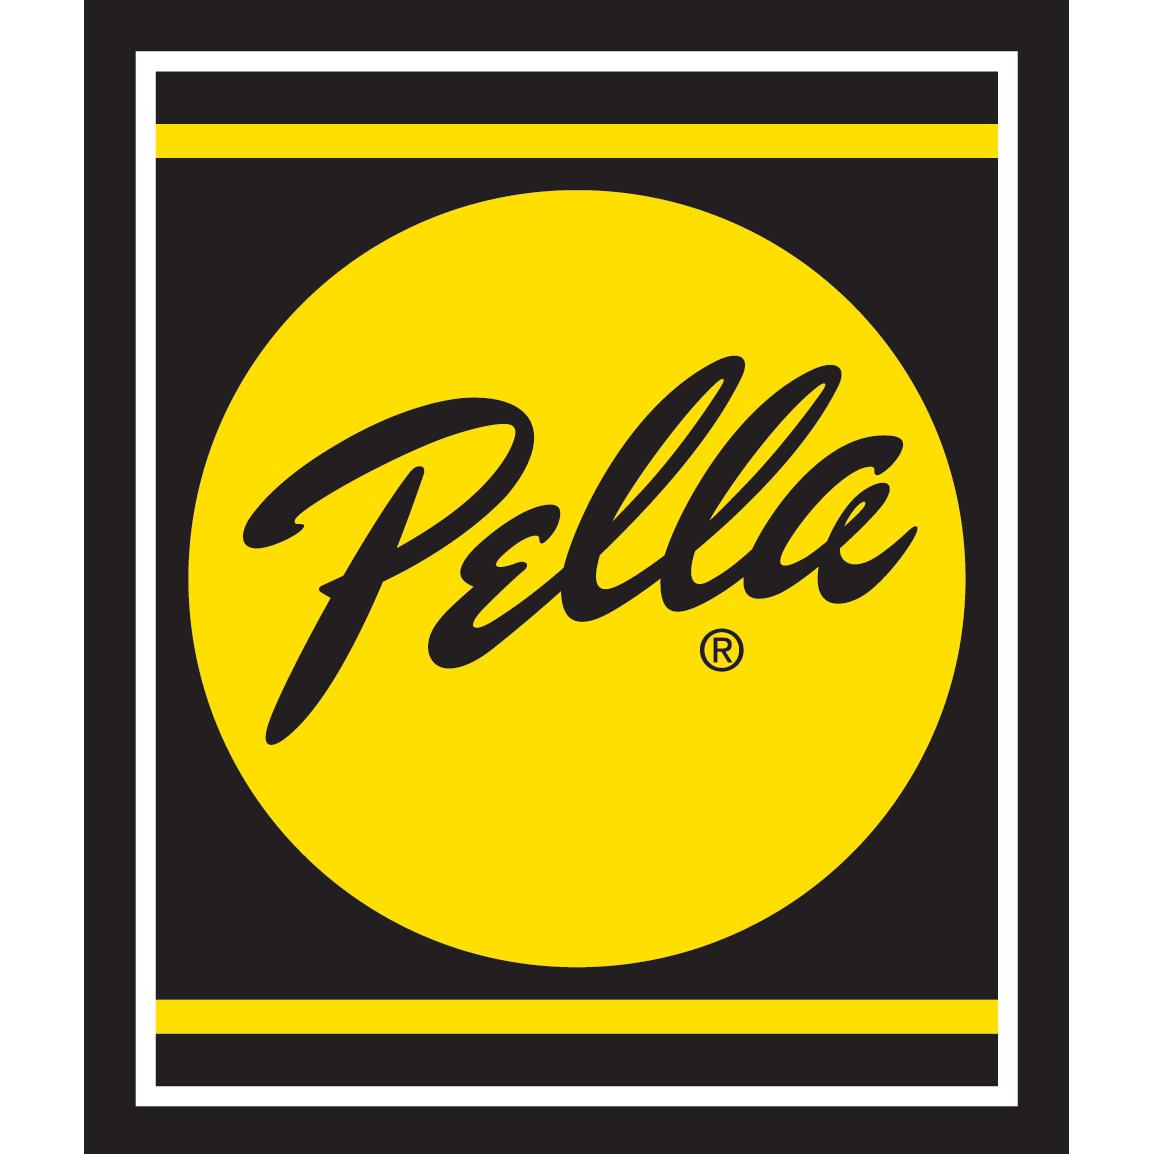 Pella windows and doors coupons near me in boone 8coupons for Windows and doors near me